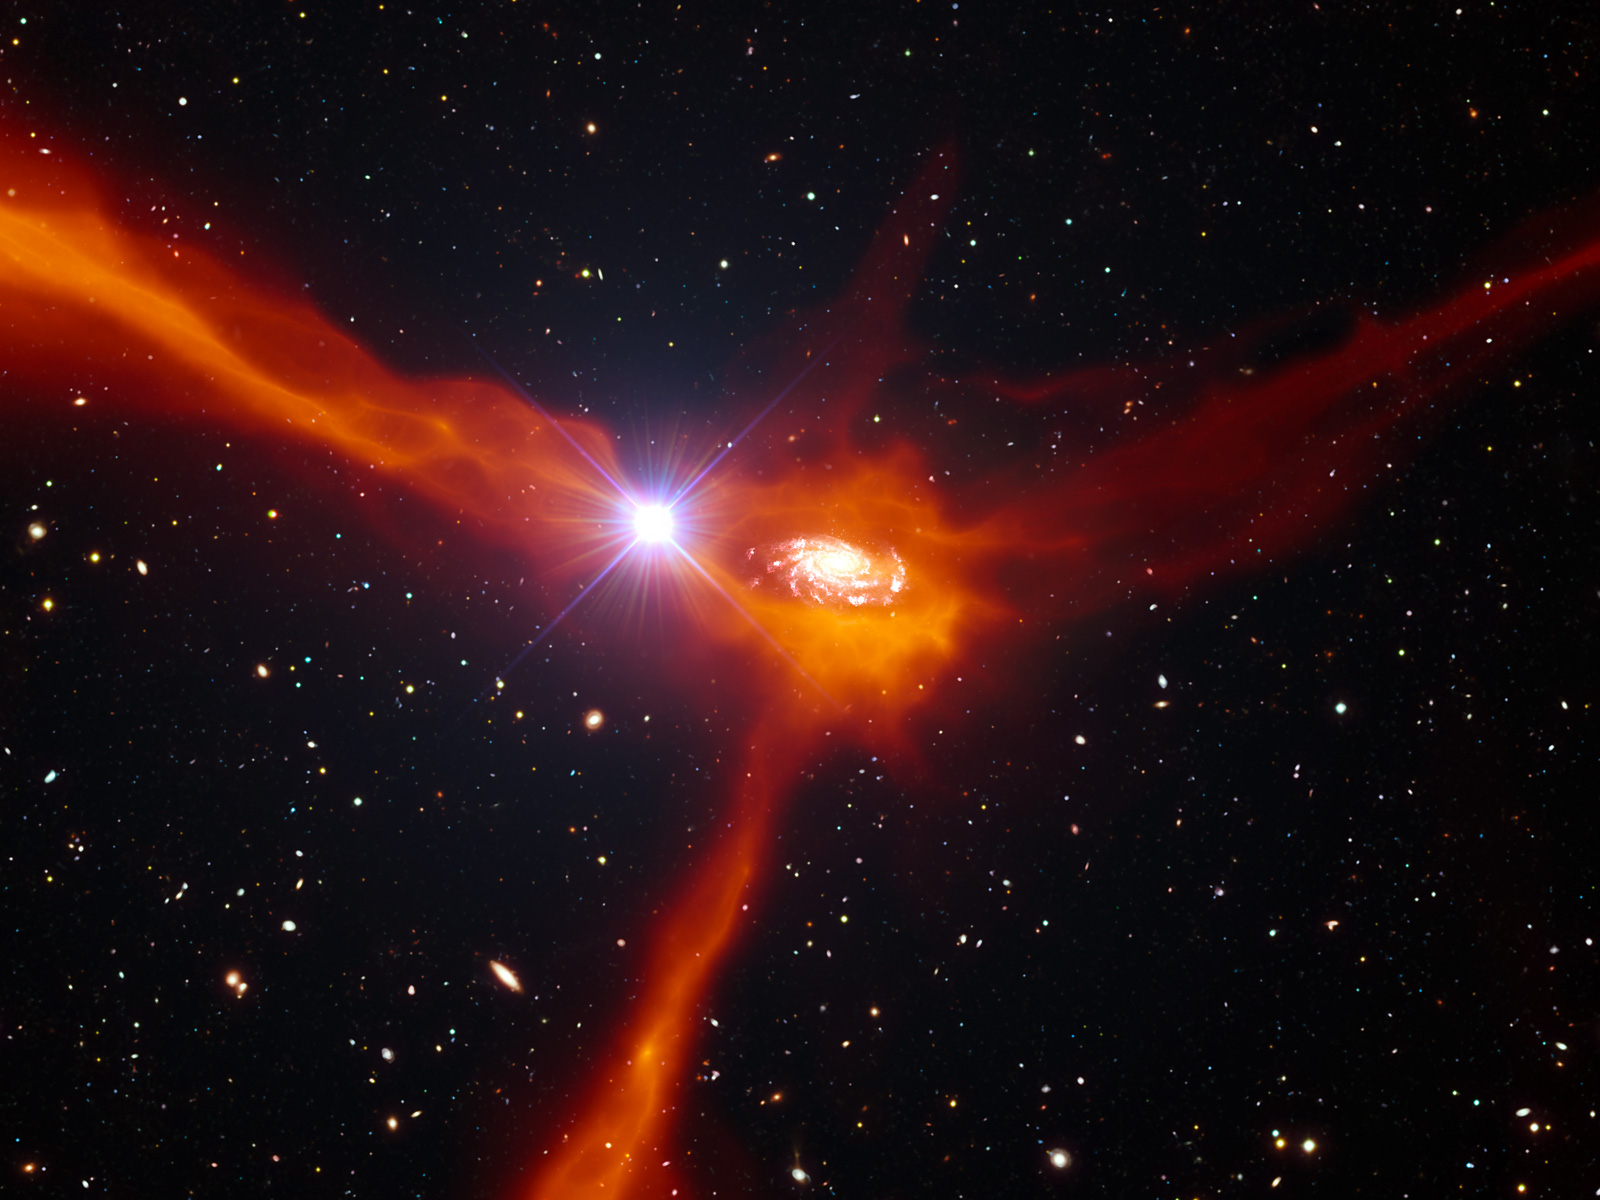 Secret Feeding Habits of Galaxies, Interstellar Spaceflight & More